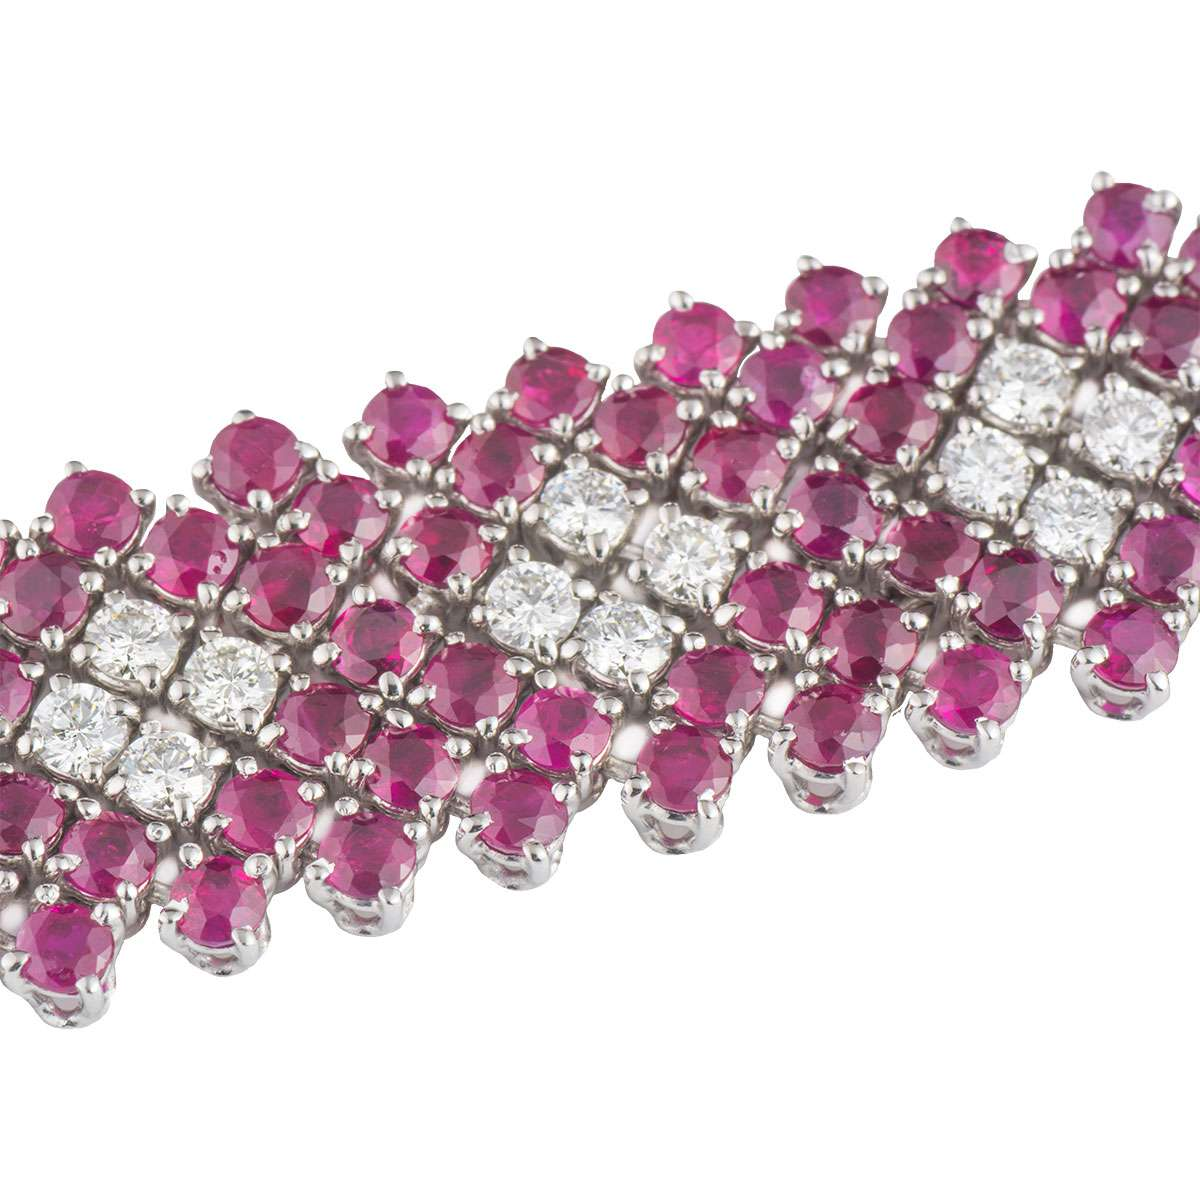 White Gold Diamond and Ruby Bracelet